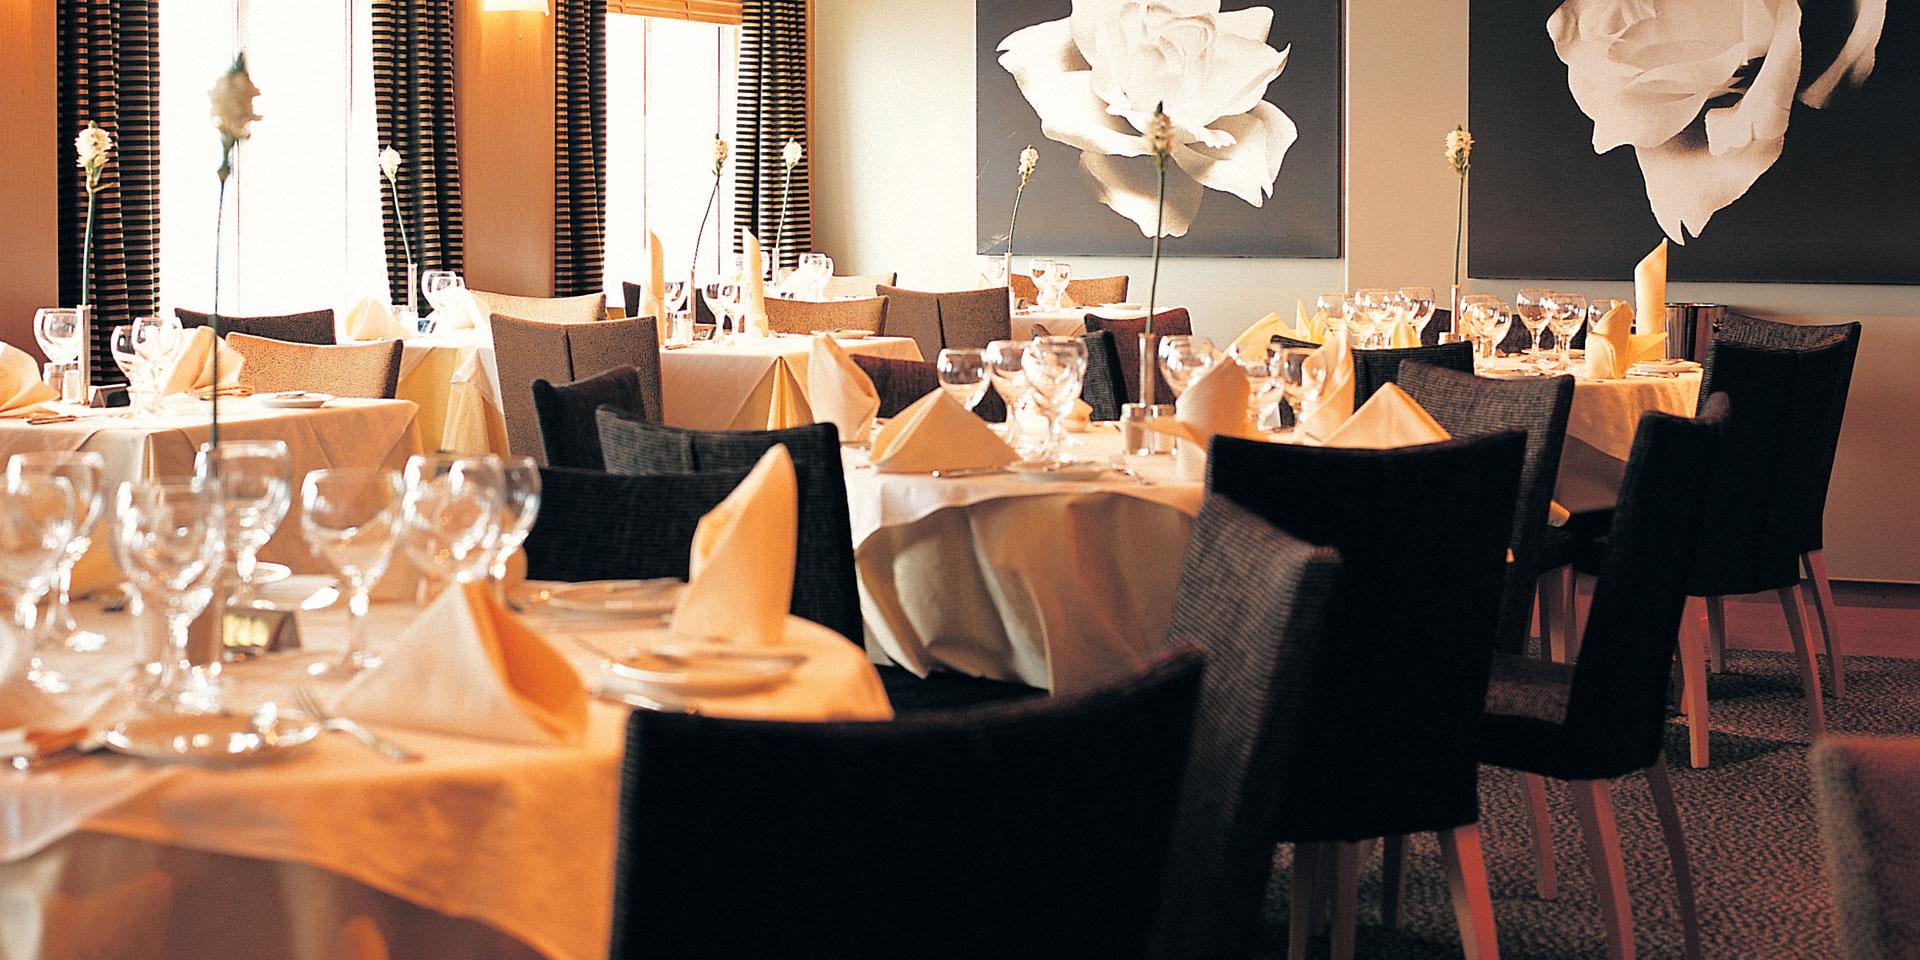 F/B Superfast XI Restaurant a la carte